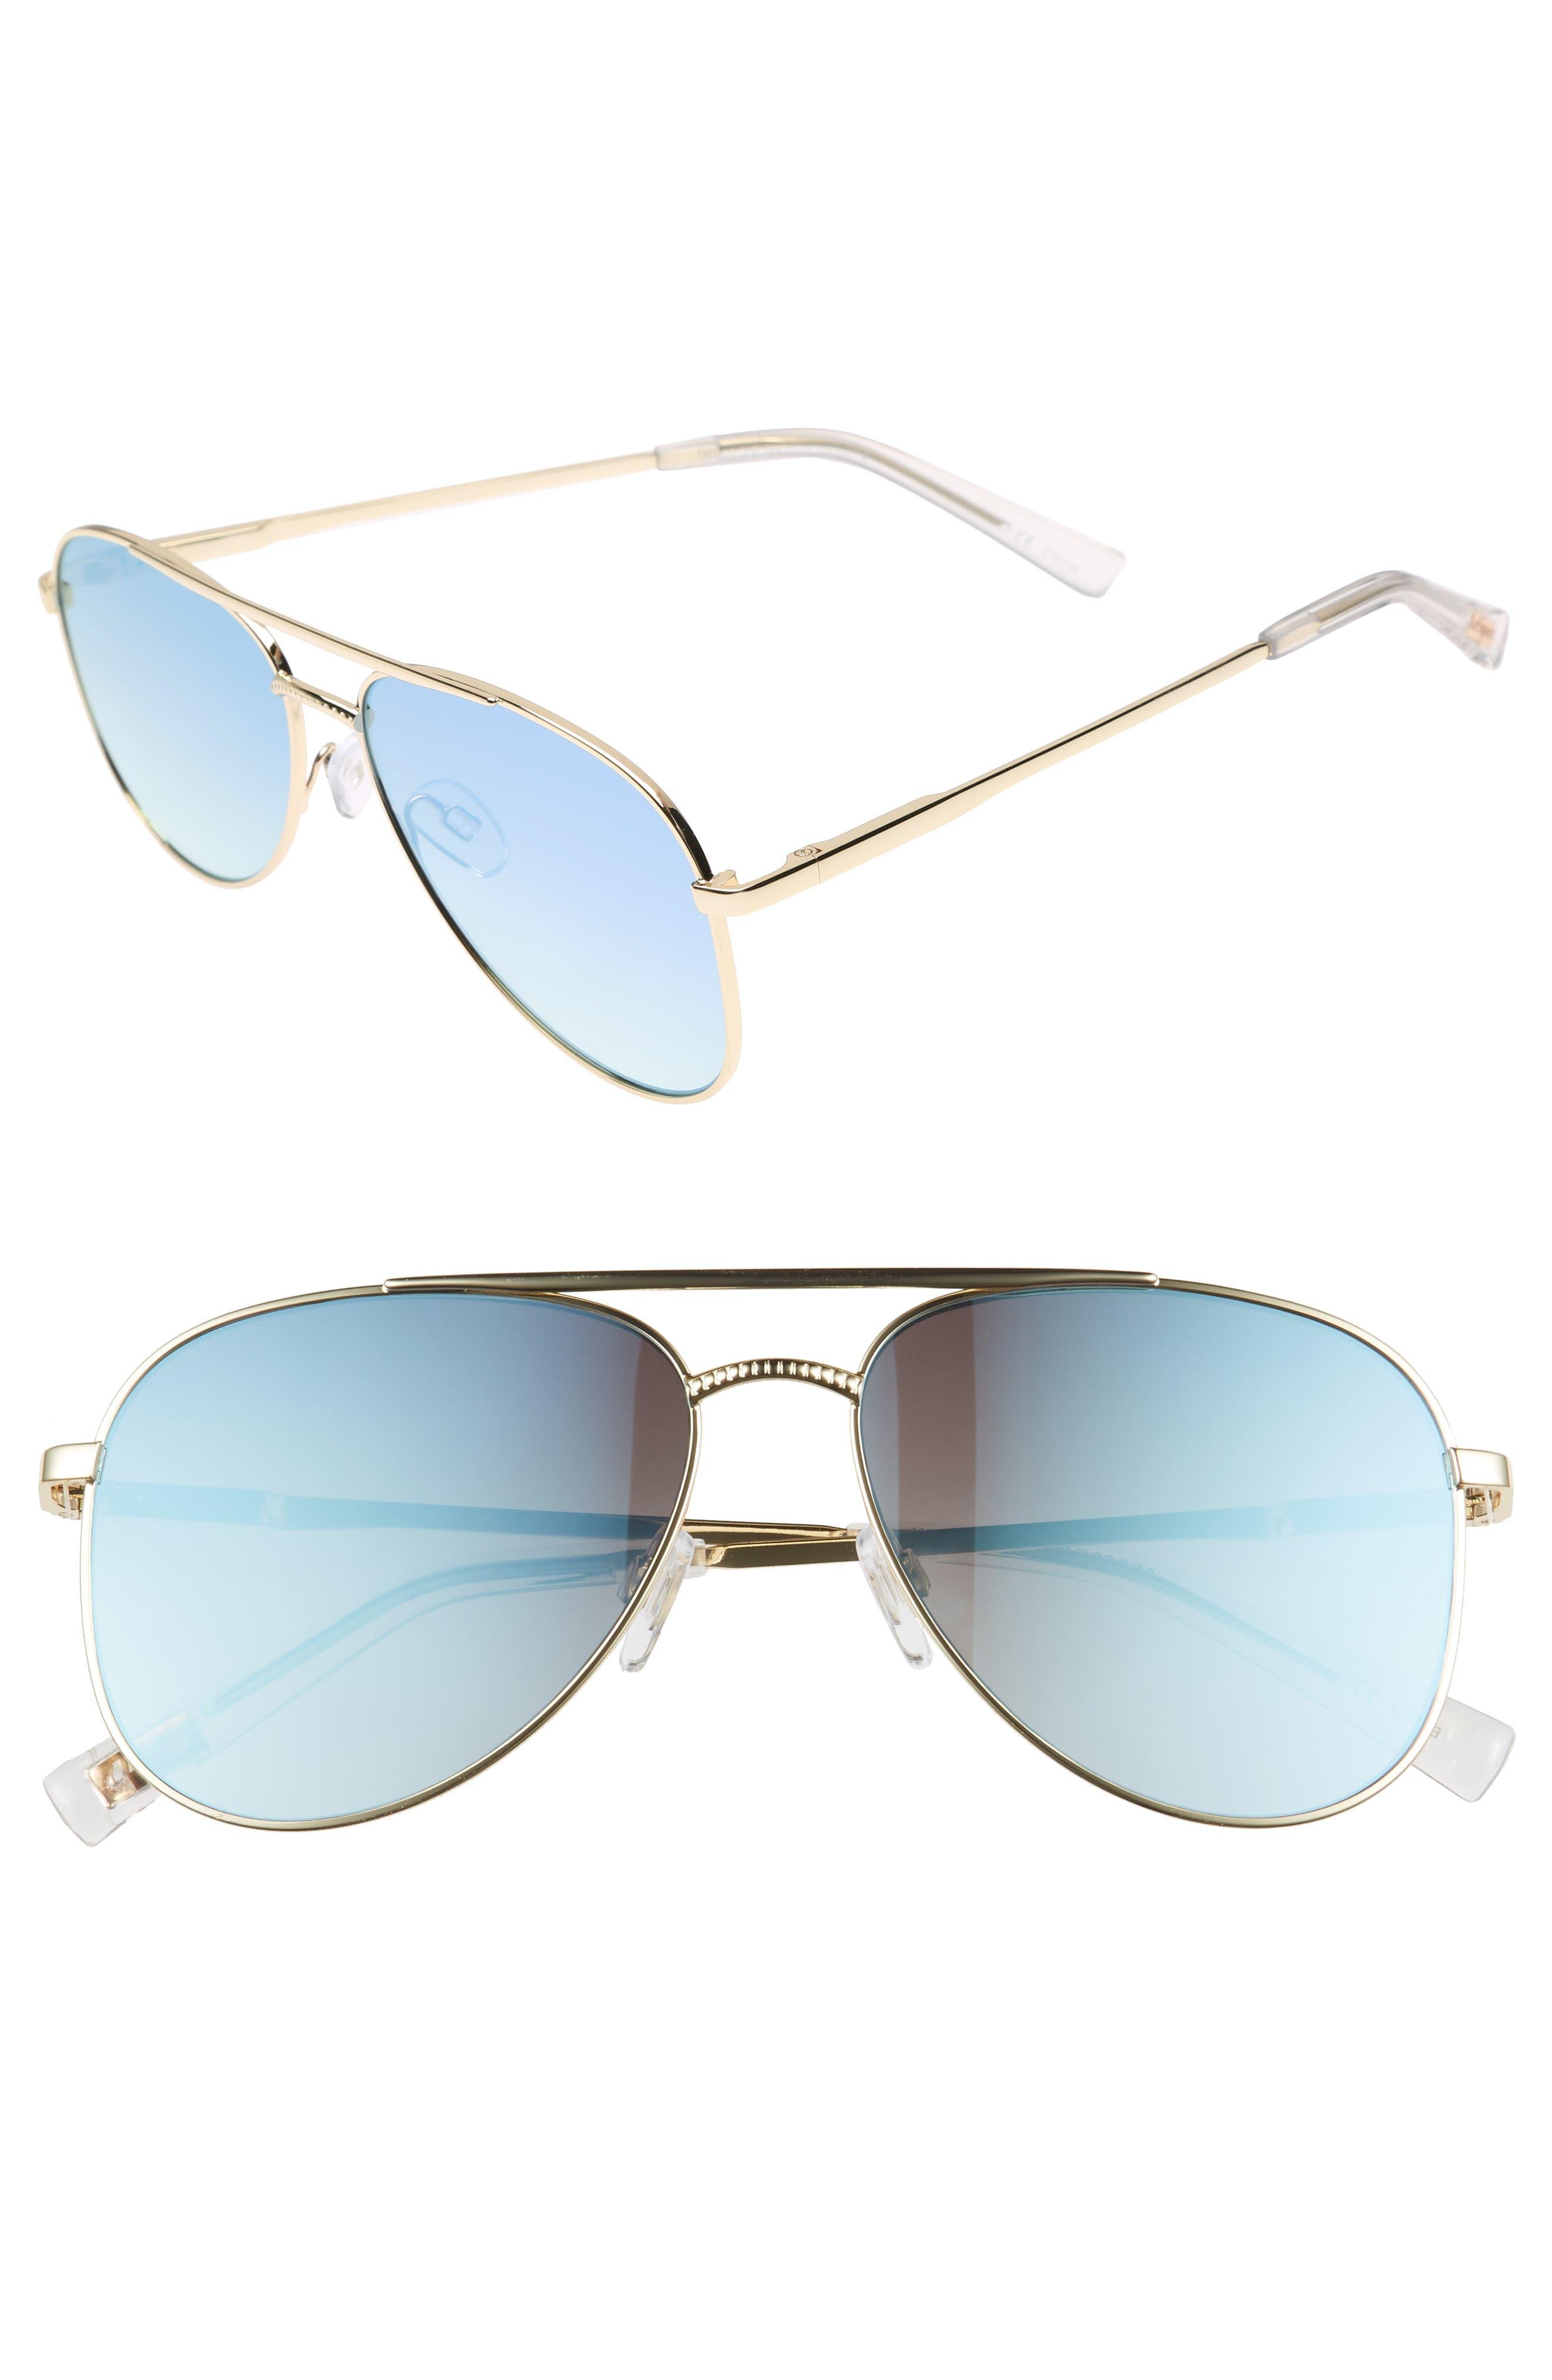 Kingdom 57mm Polarized Aviator Sunglasses,                             Main thumbnail 2, color,